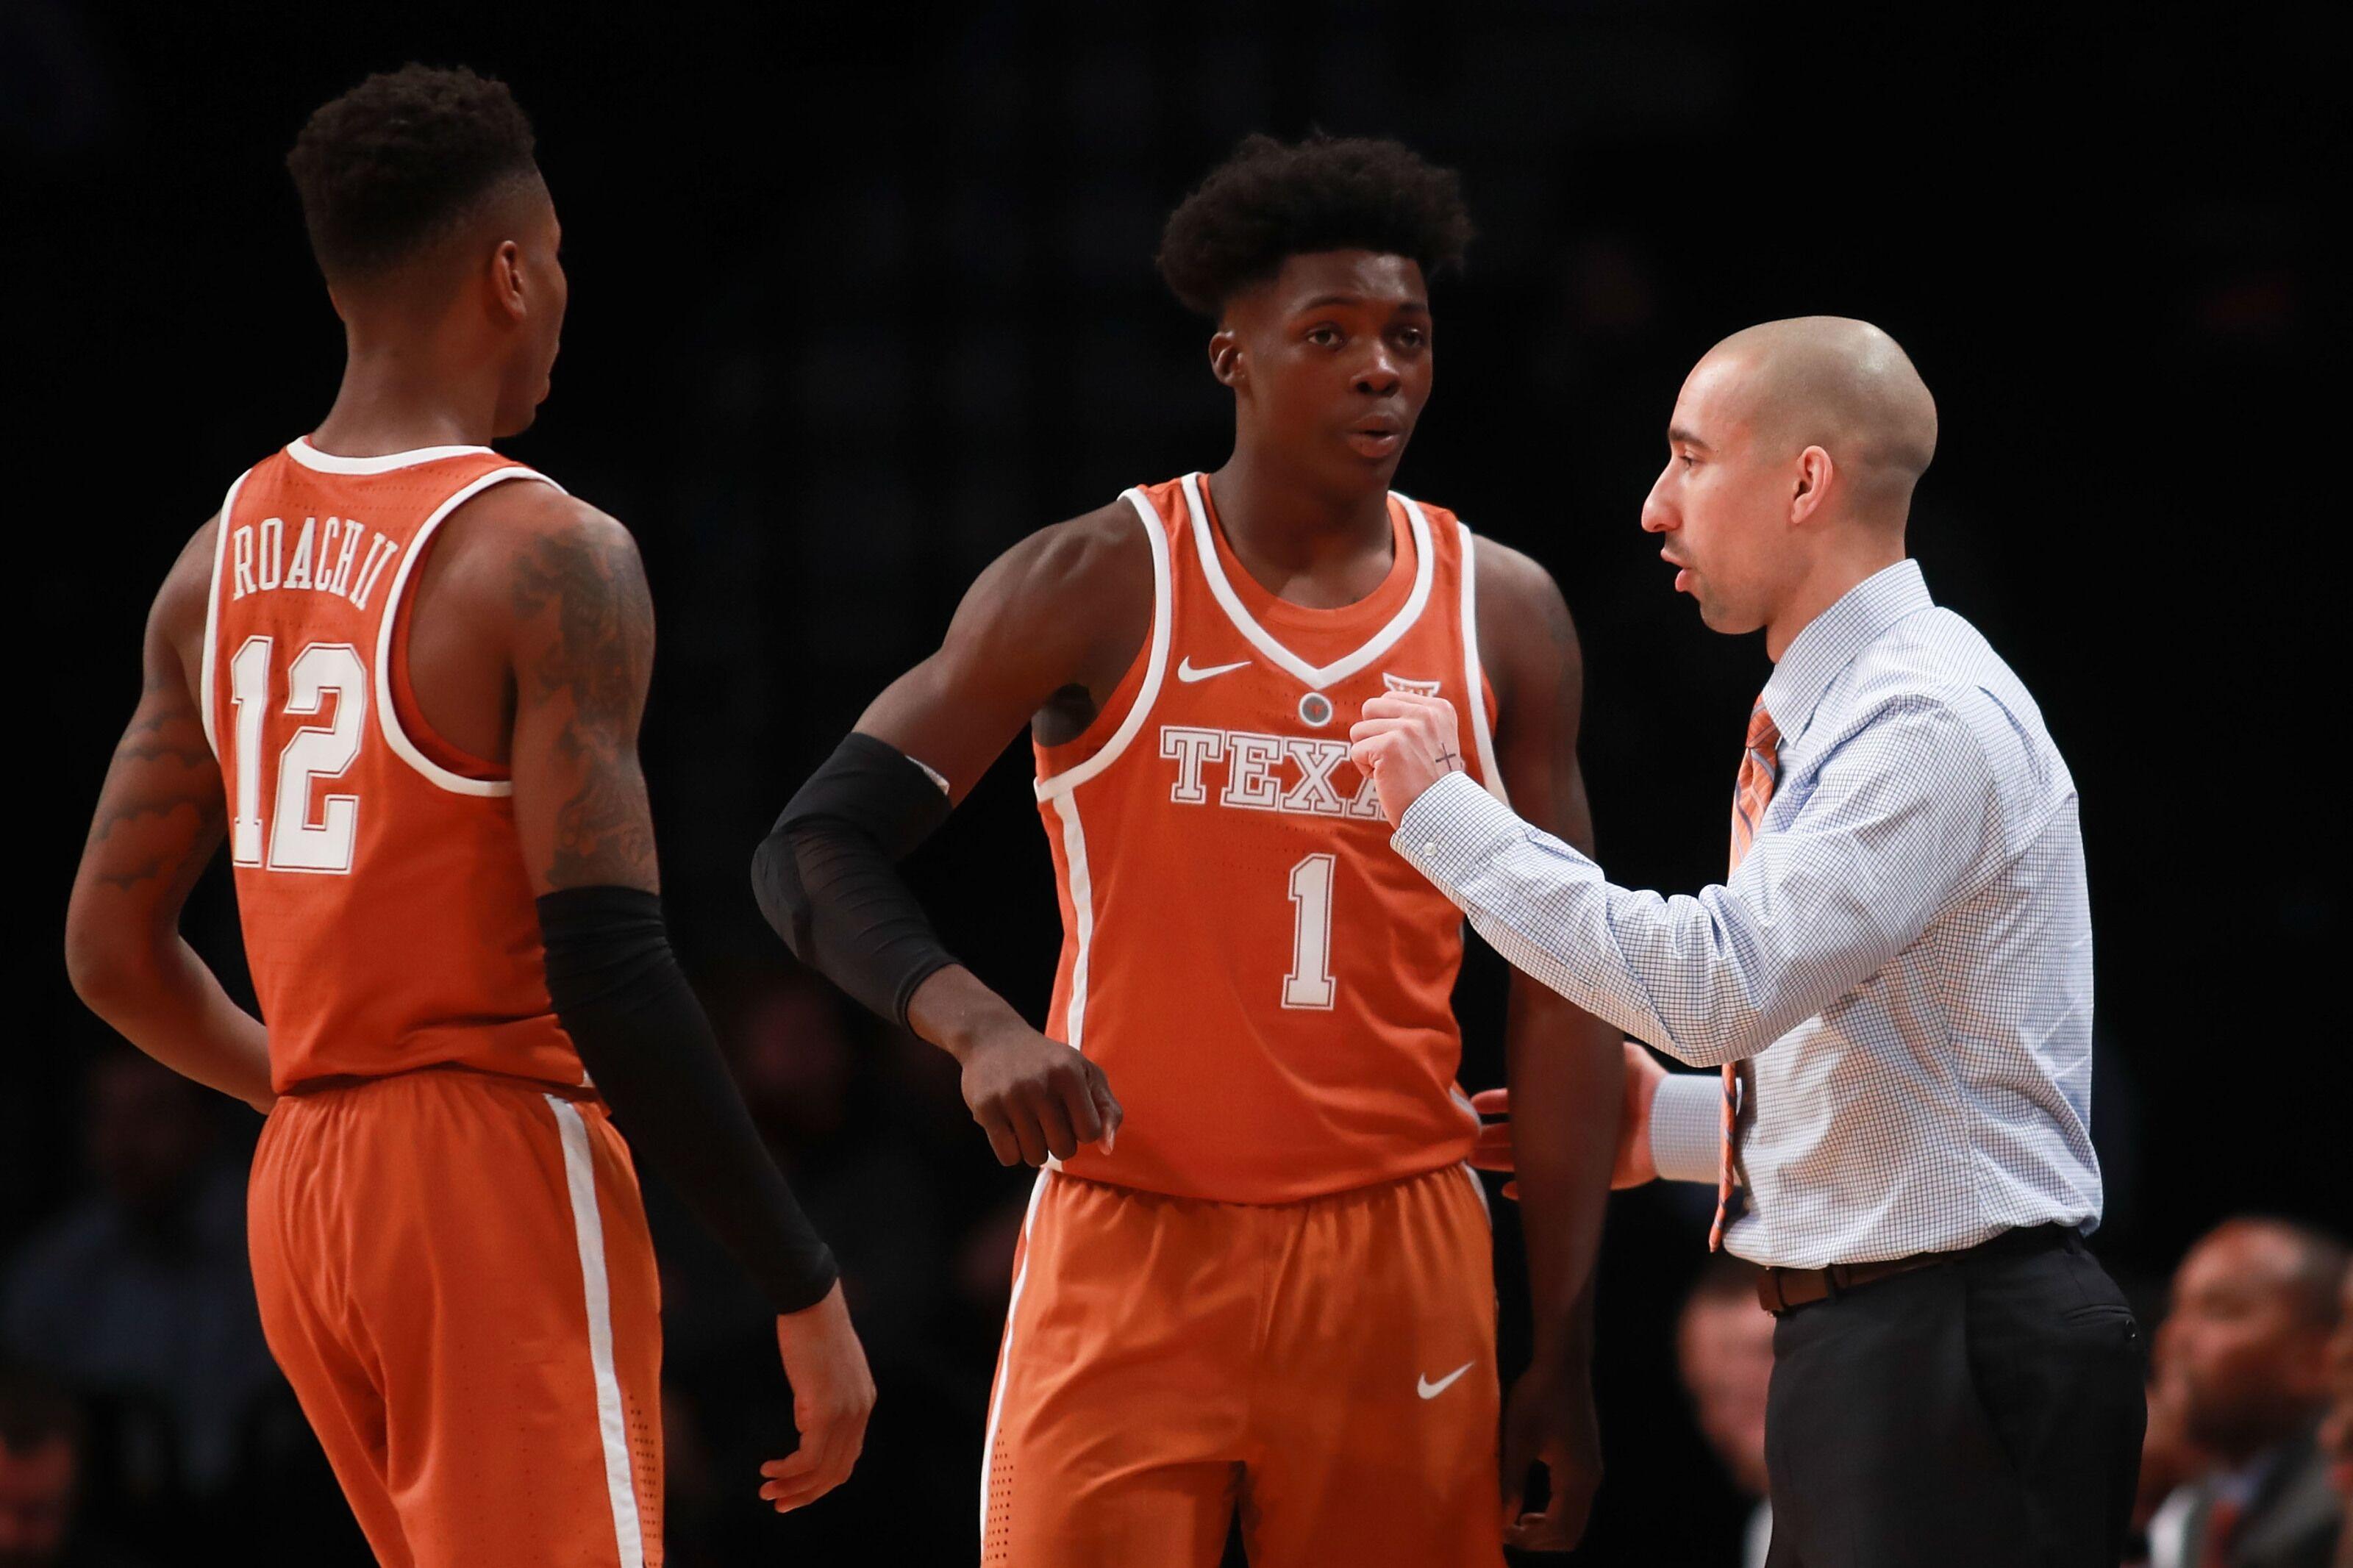 Texas Basketball: Longhorns re-gain edge by beating UAB 67-57